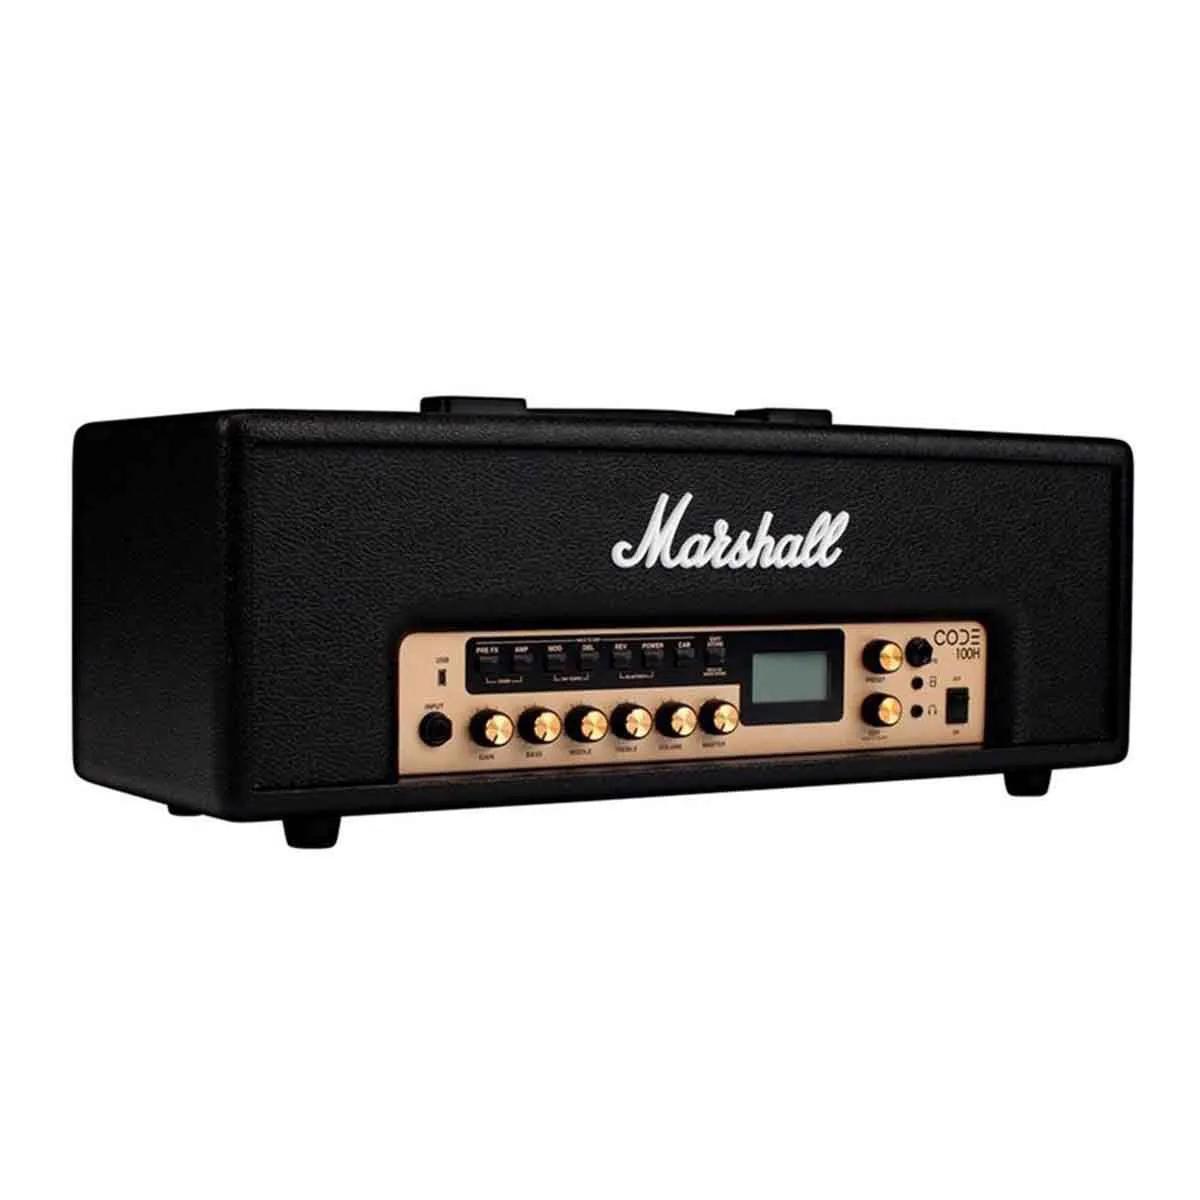 Cabeçote Marshall CODE100H 100W para Guitarra